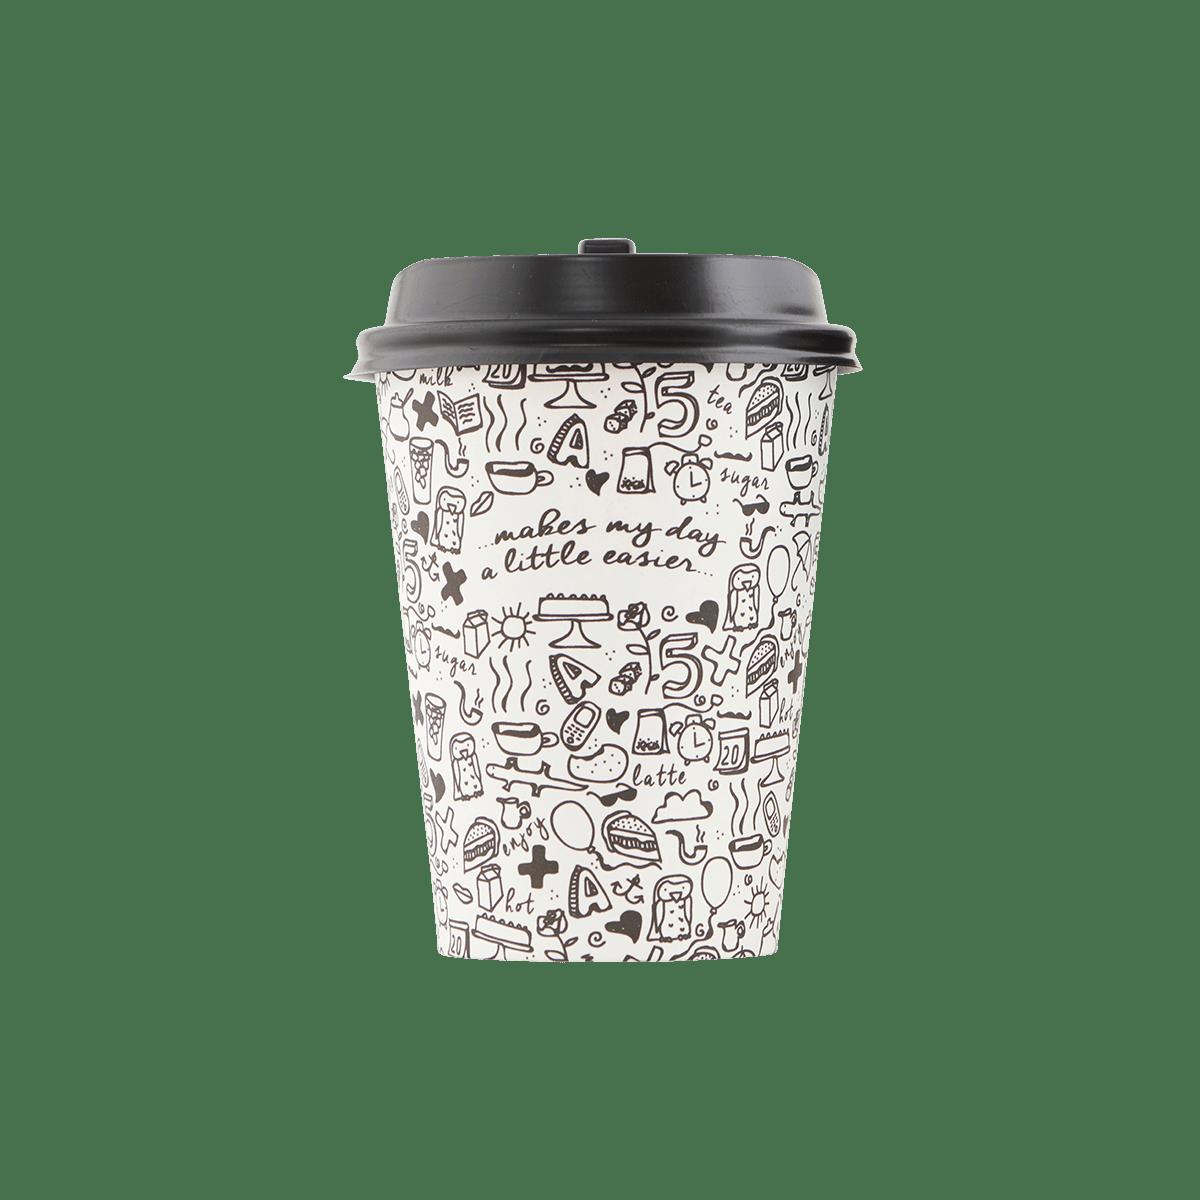 Sada hrnků s víčkem Coffee Addiction - černo-bílé